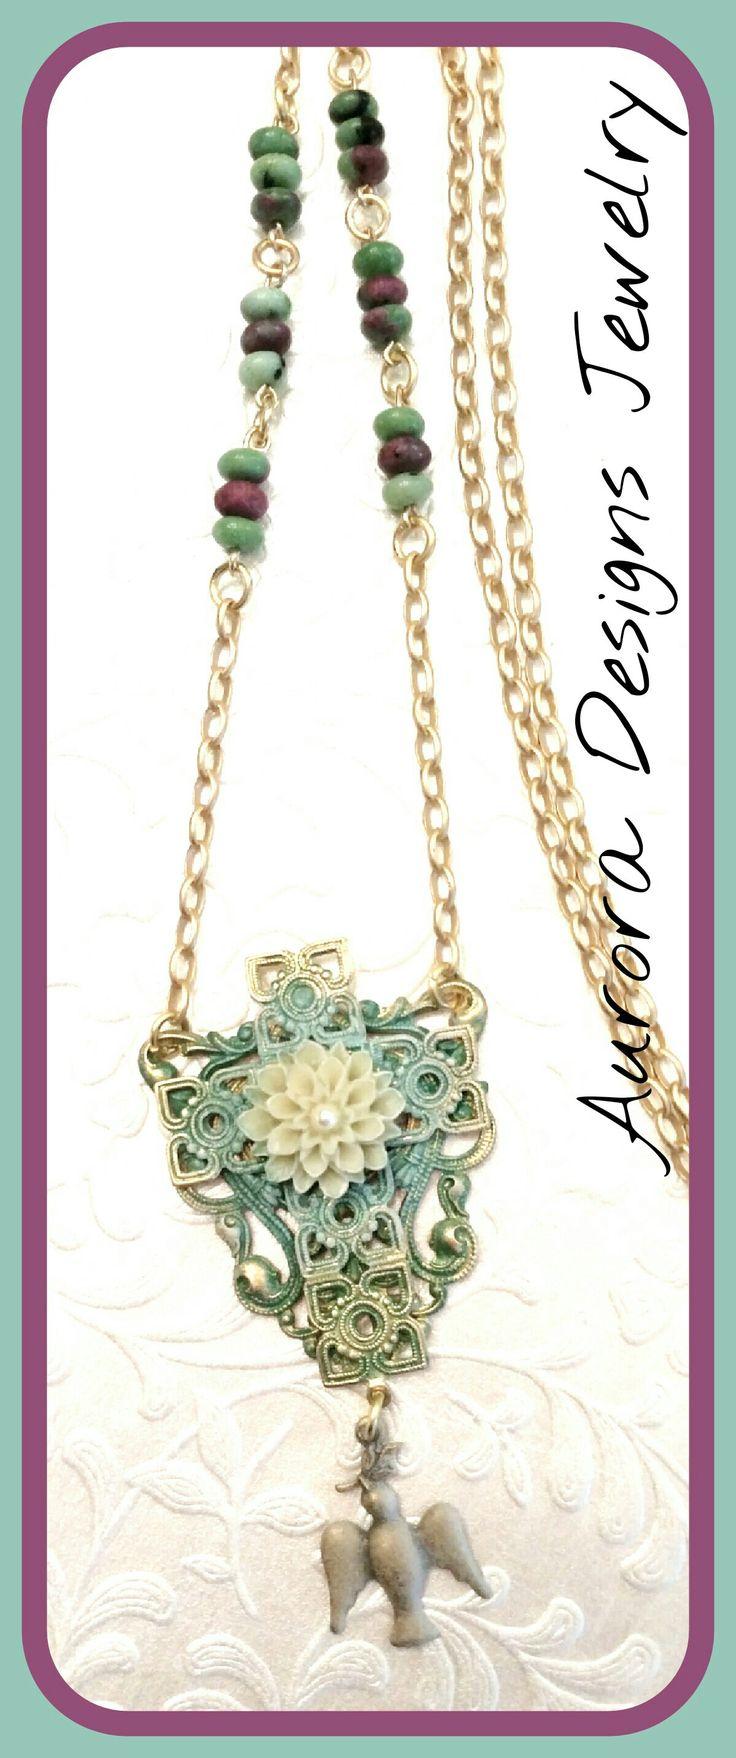 Change It Up Challenge  Aurora Designs Jewelry by Marcia Tuzzolino